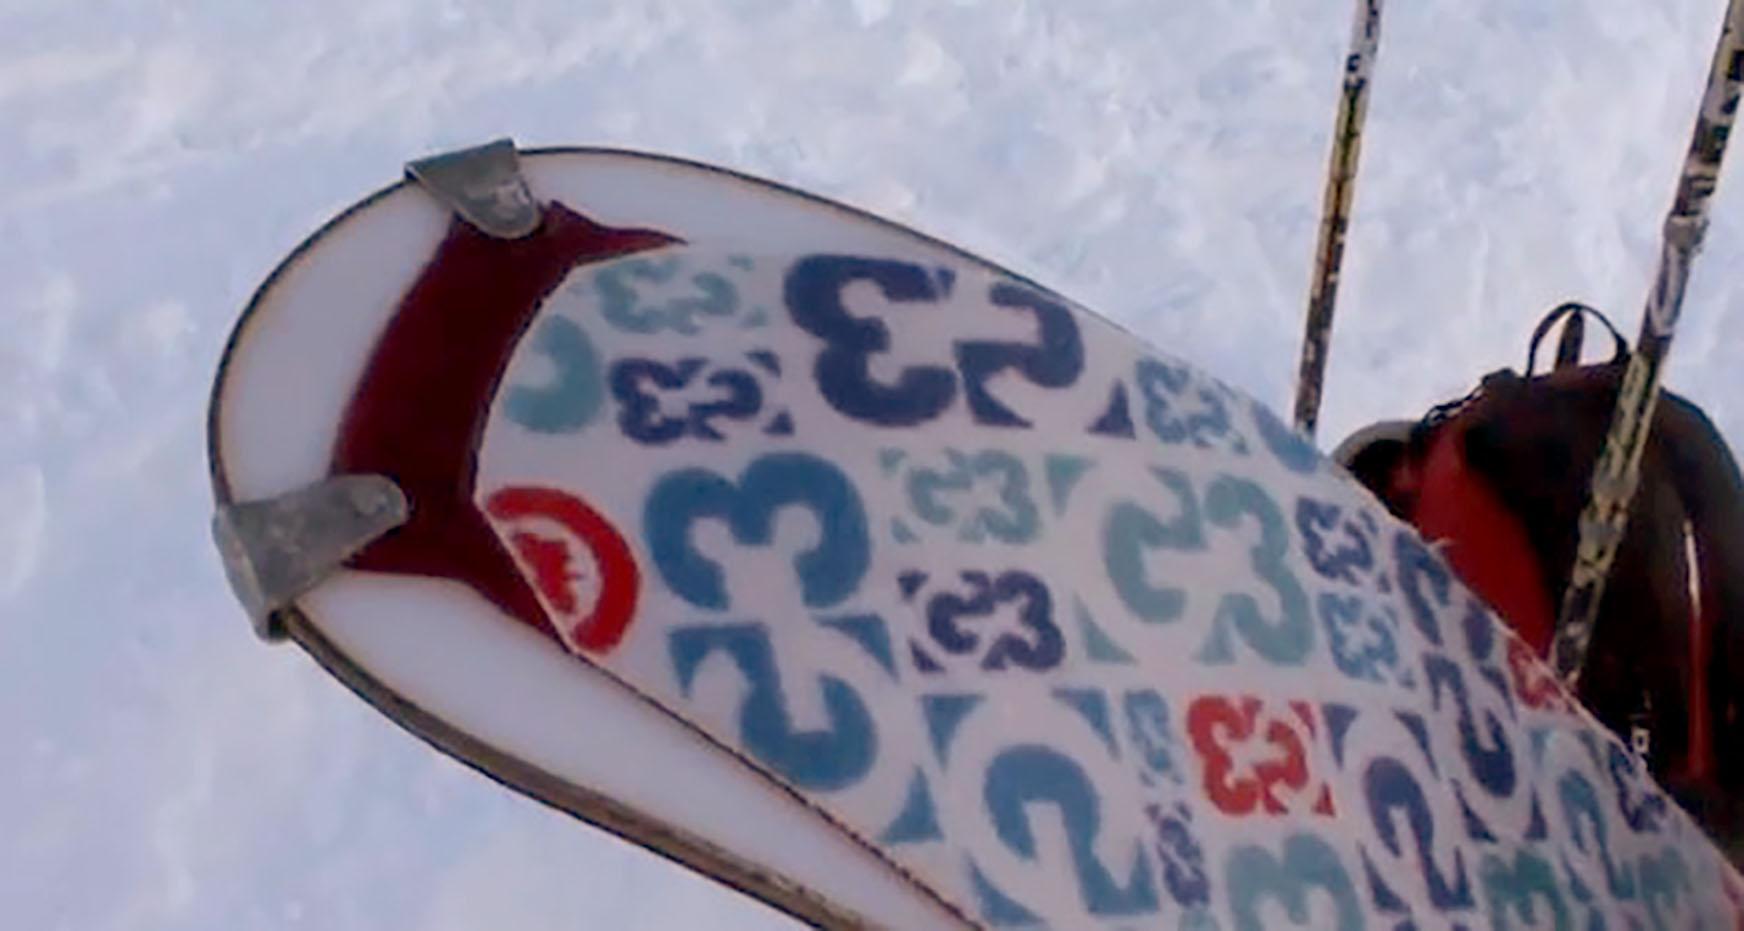 G3 Skis bottom.jpg